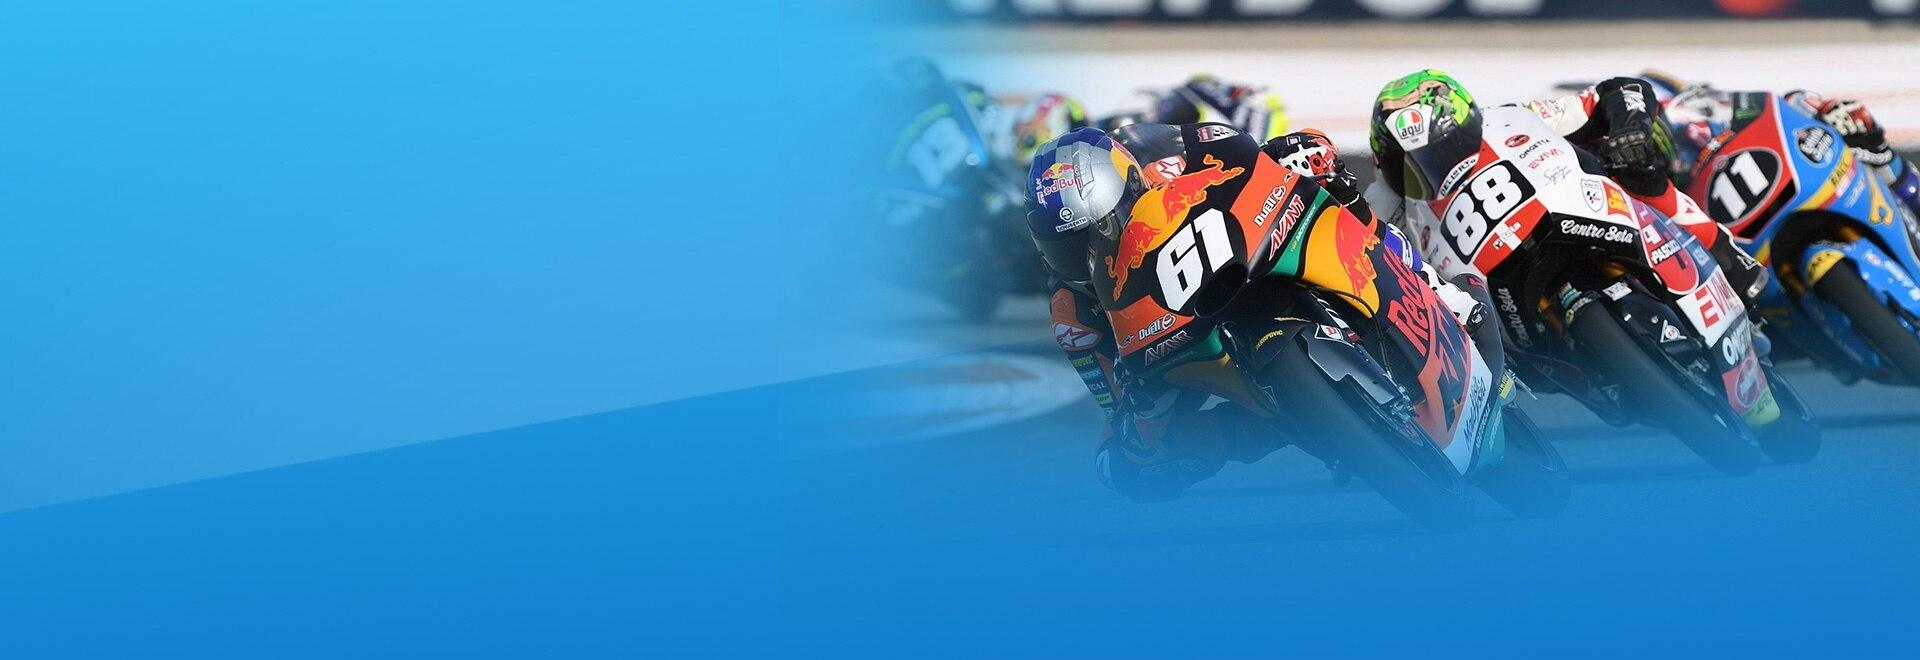 GP Valencia: Moto3. Gara 1